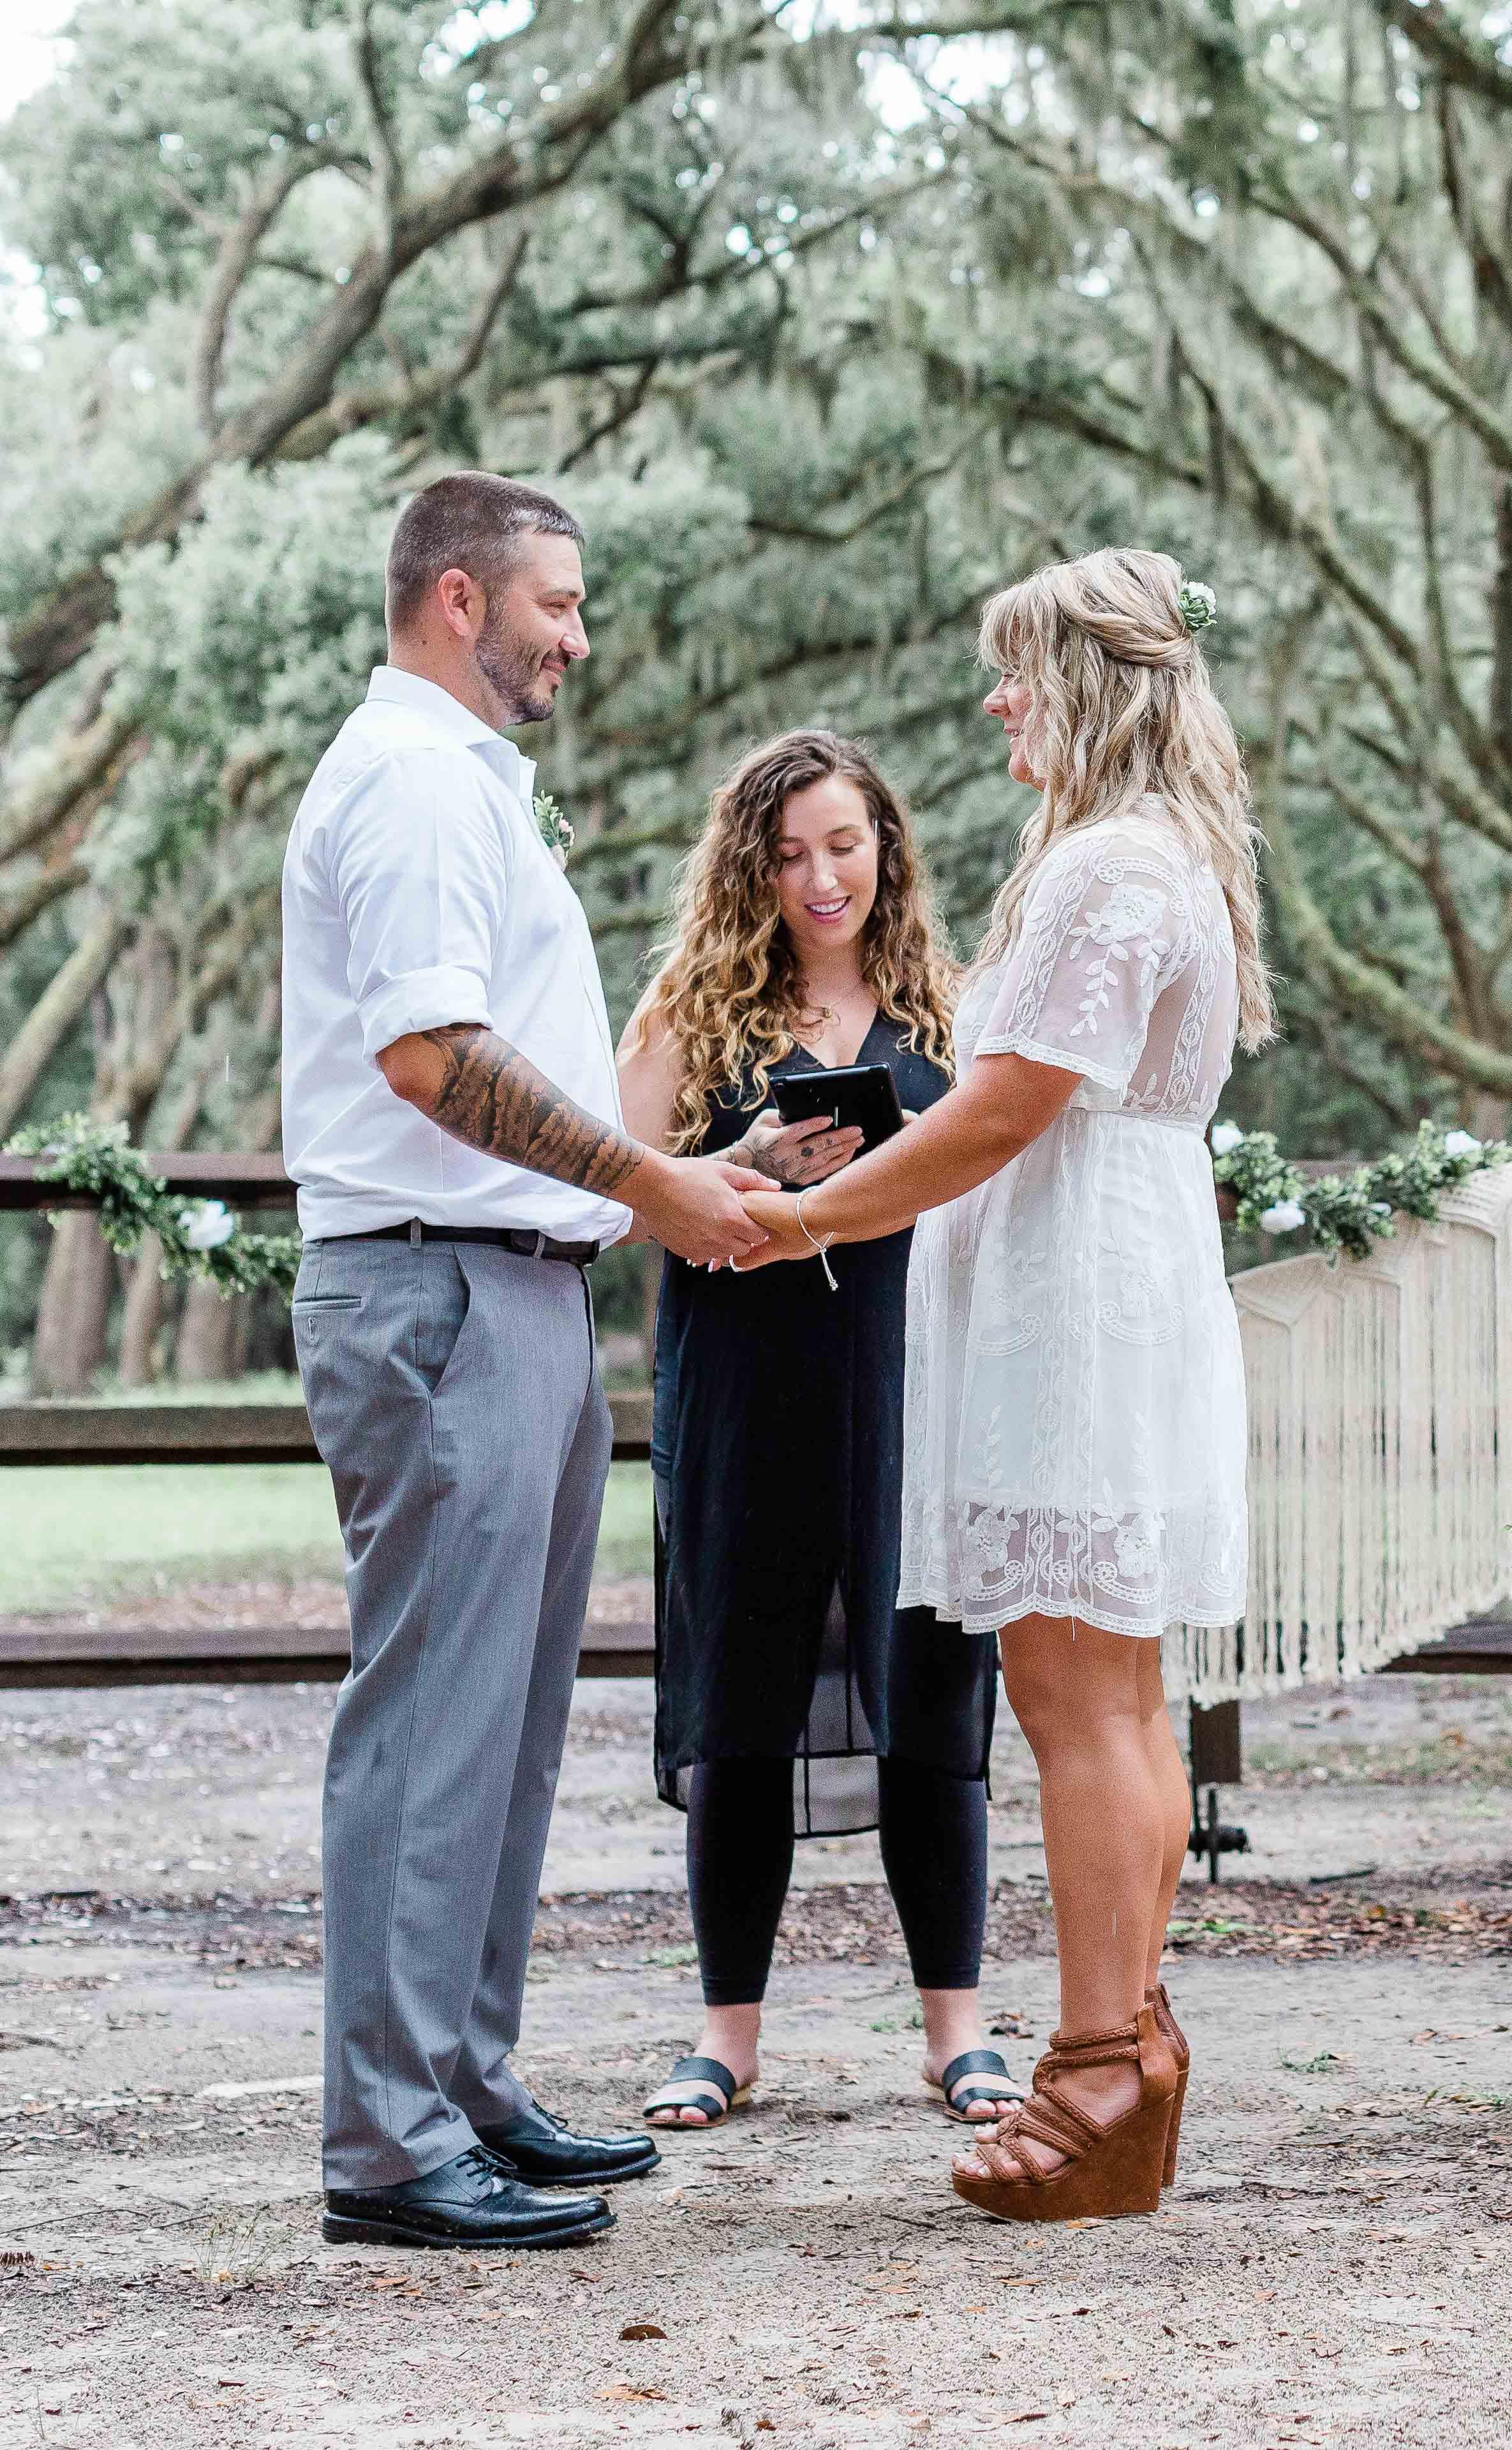 20190727Georgia-Wormlsoe Plantation-Simply Eloped-Savannah Wedding Photographer- Southern Lens Photography03.jpg